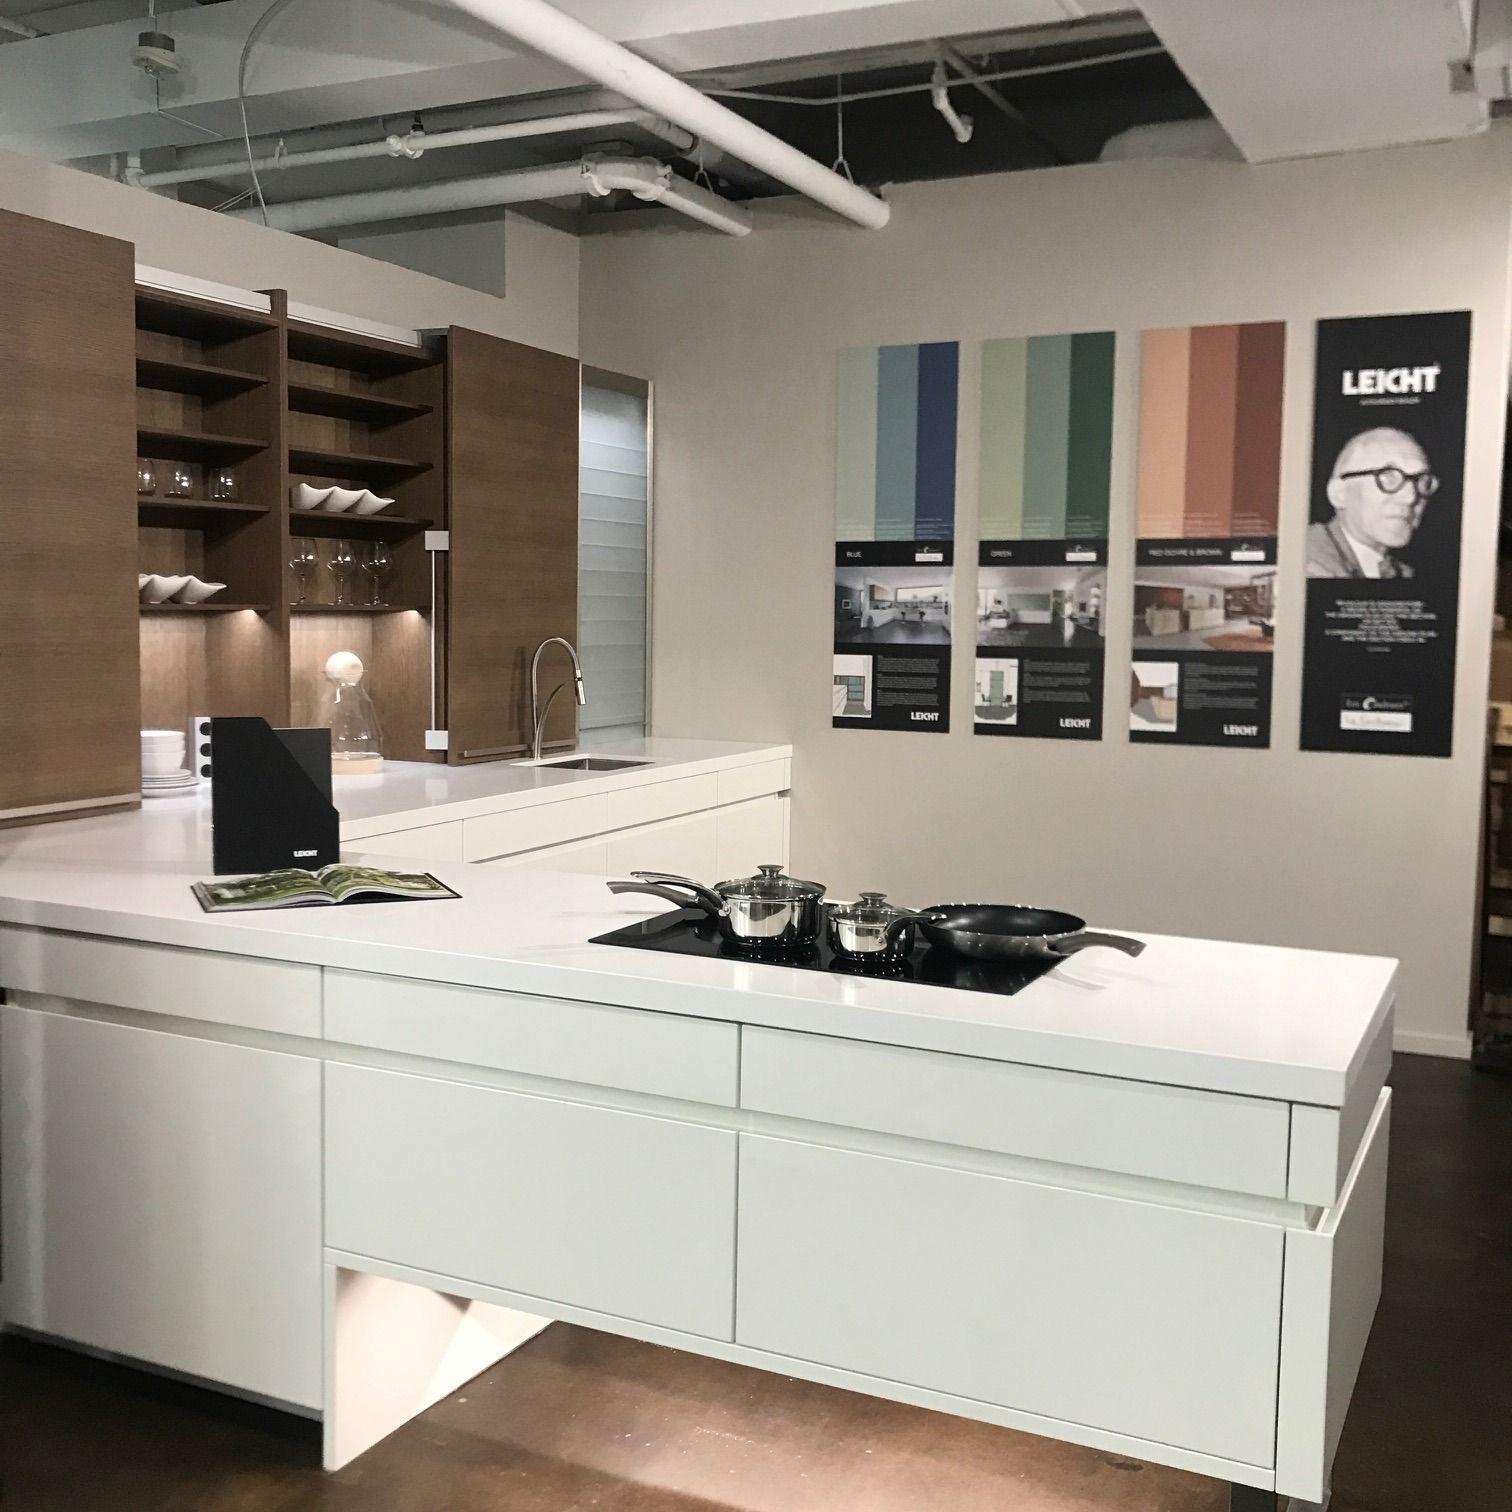 European Style Kitchen Remodeling Ideas: German Kitchen Center Showcases Award-winning Italian And